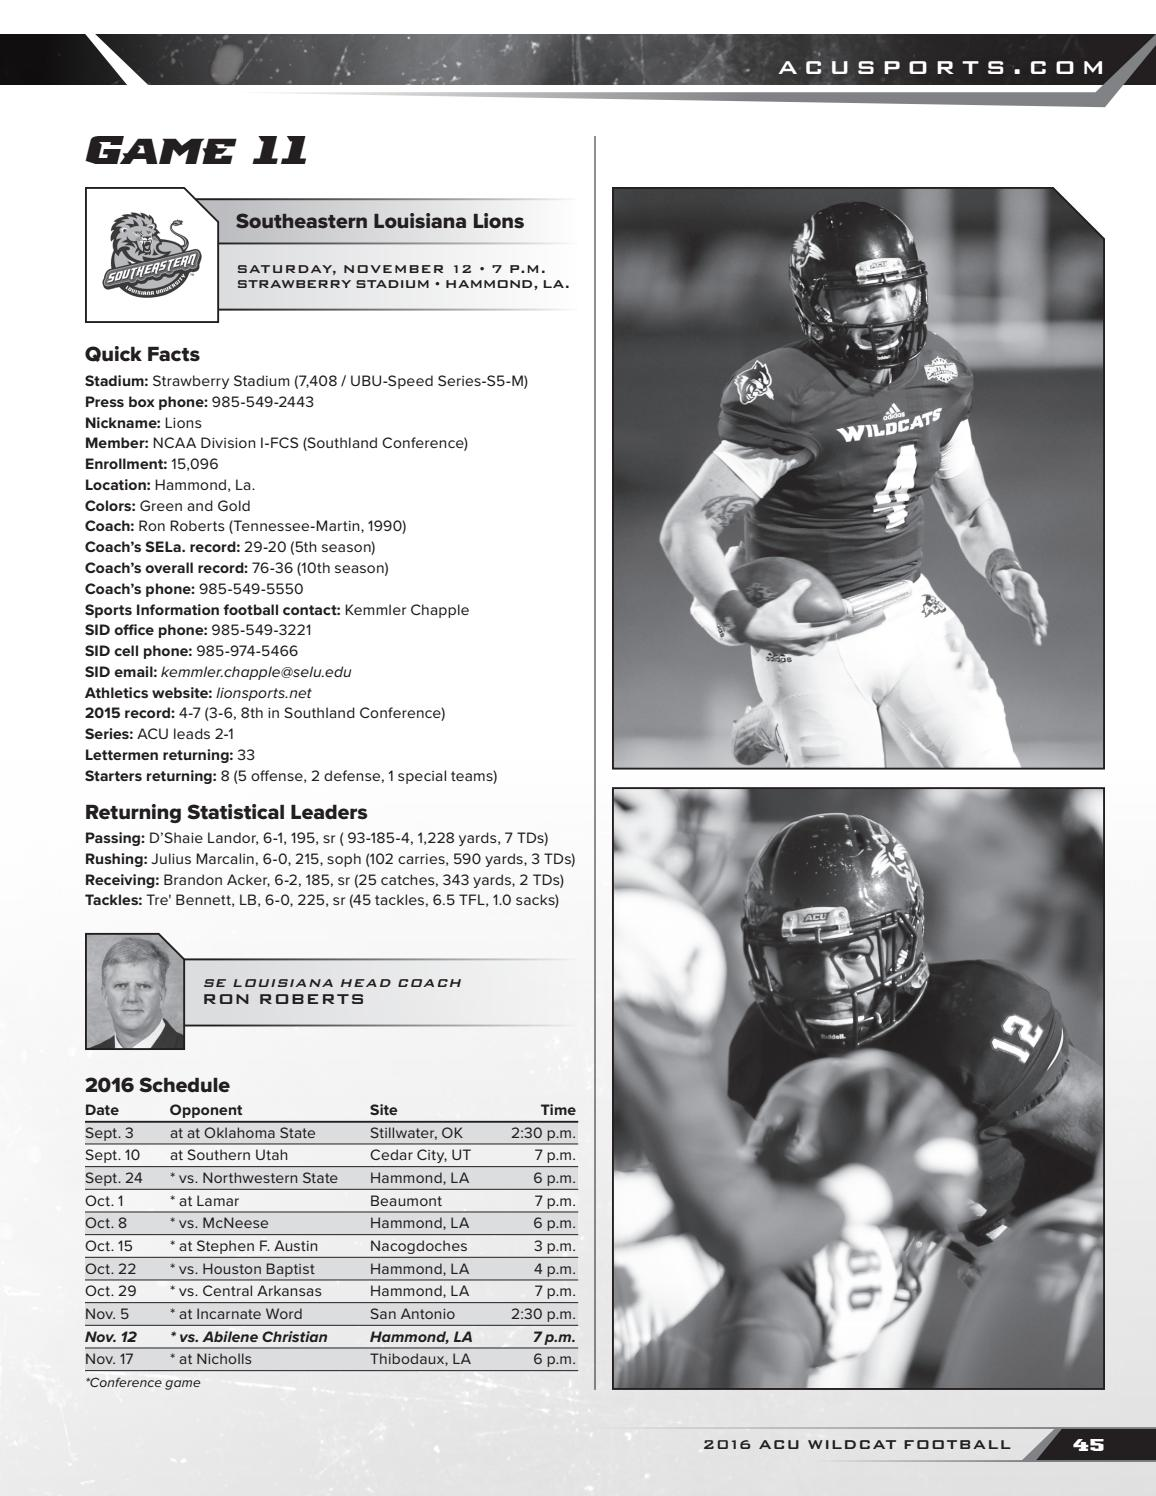 2016 Acu Wildcat Football Media Guide By Abilene Christian